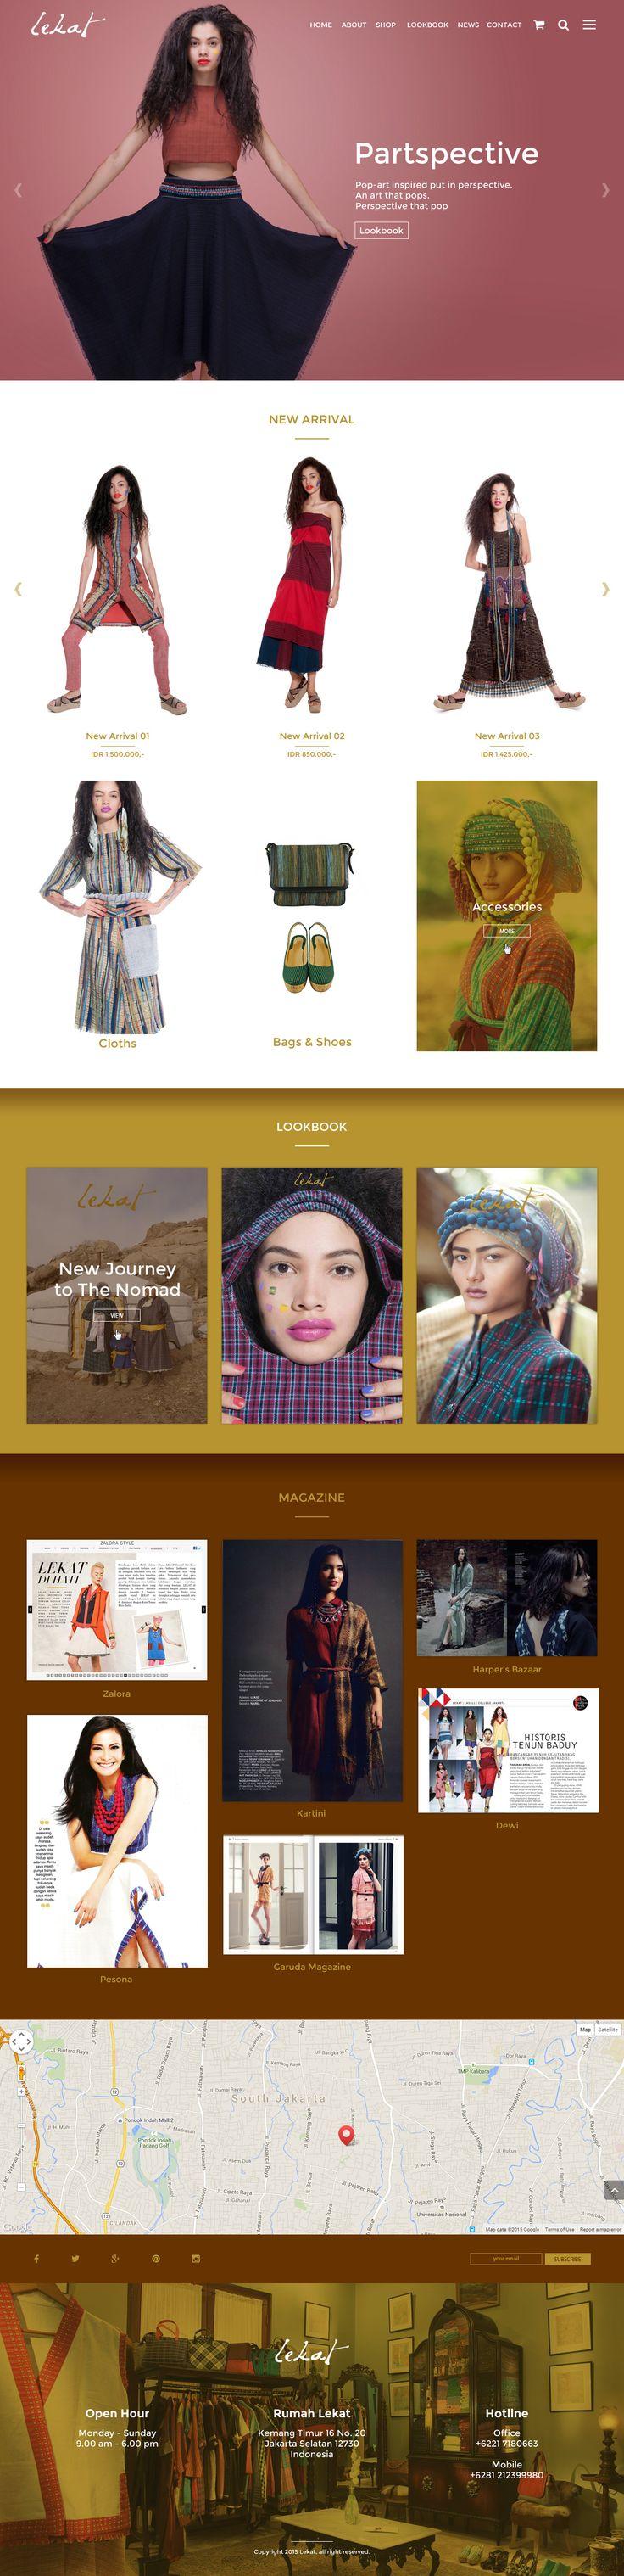 Web Design Mockup v1 - Lekat - ReeZh Design